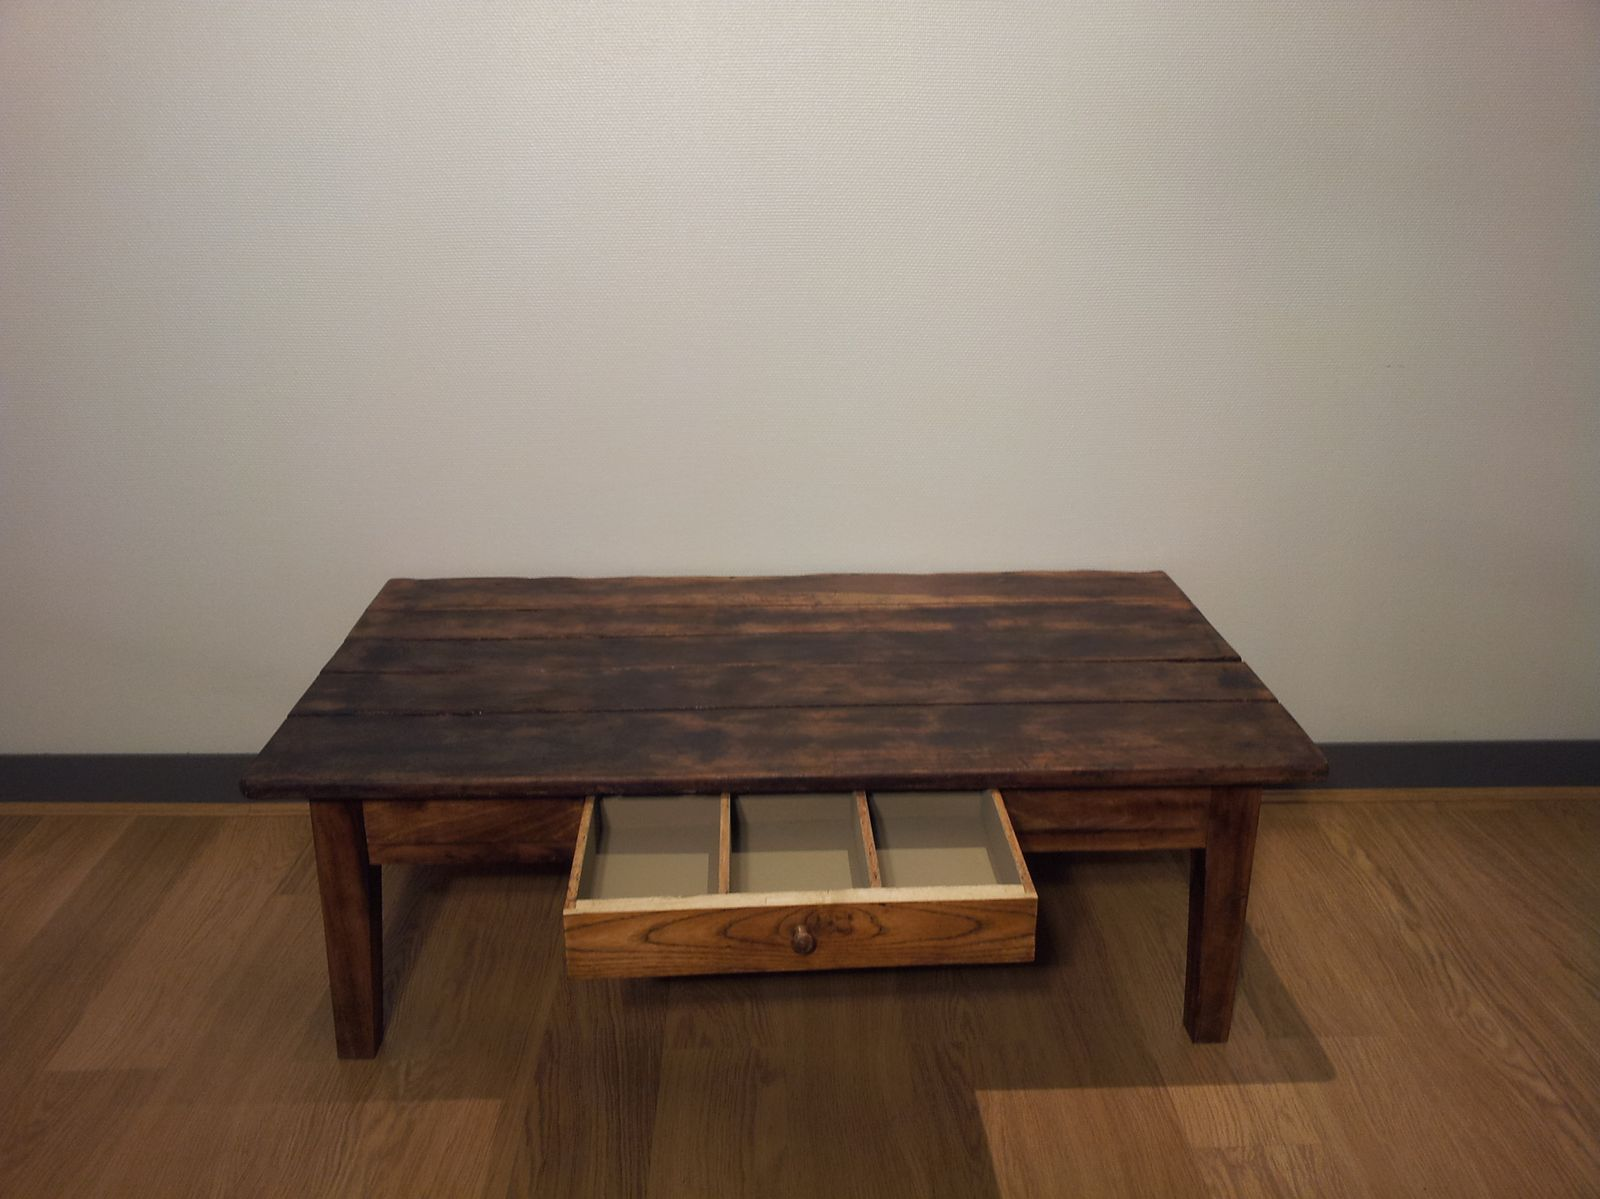 Table avec tiroir ouvert